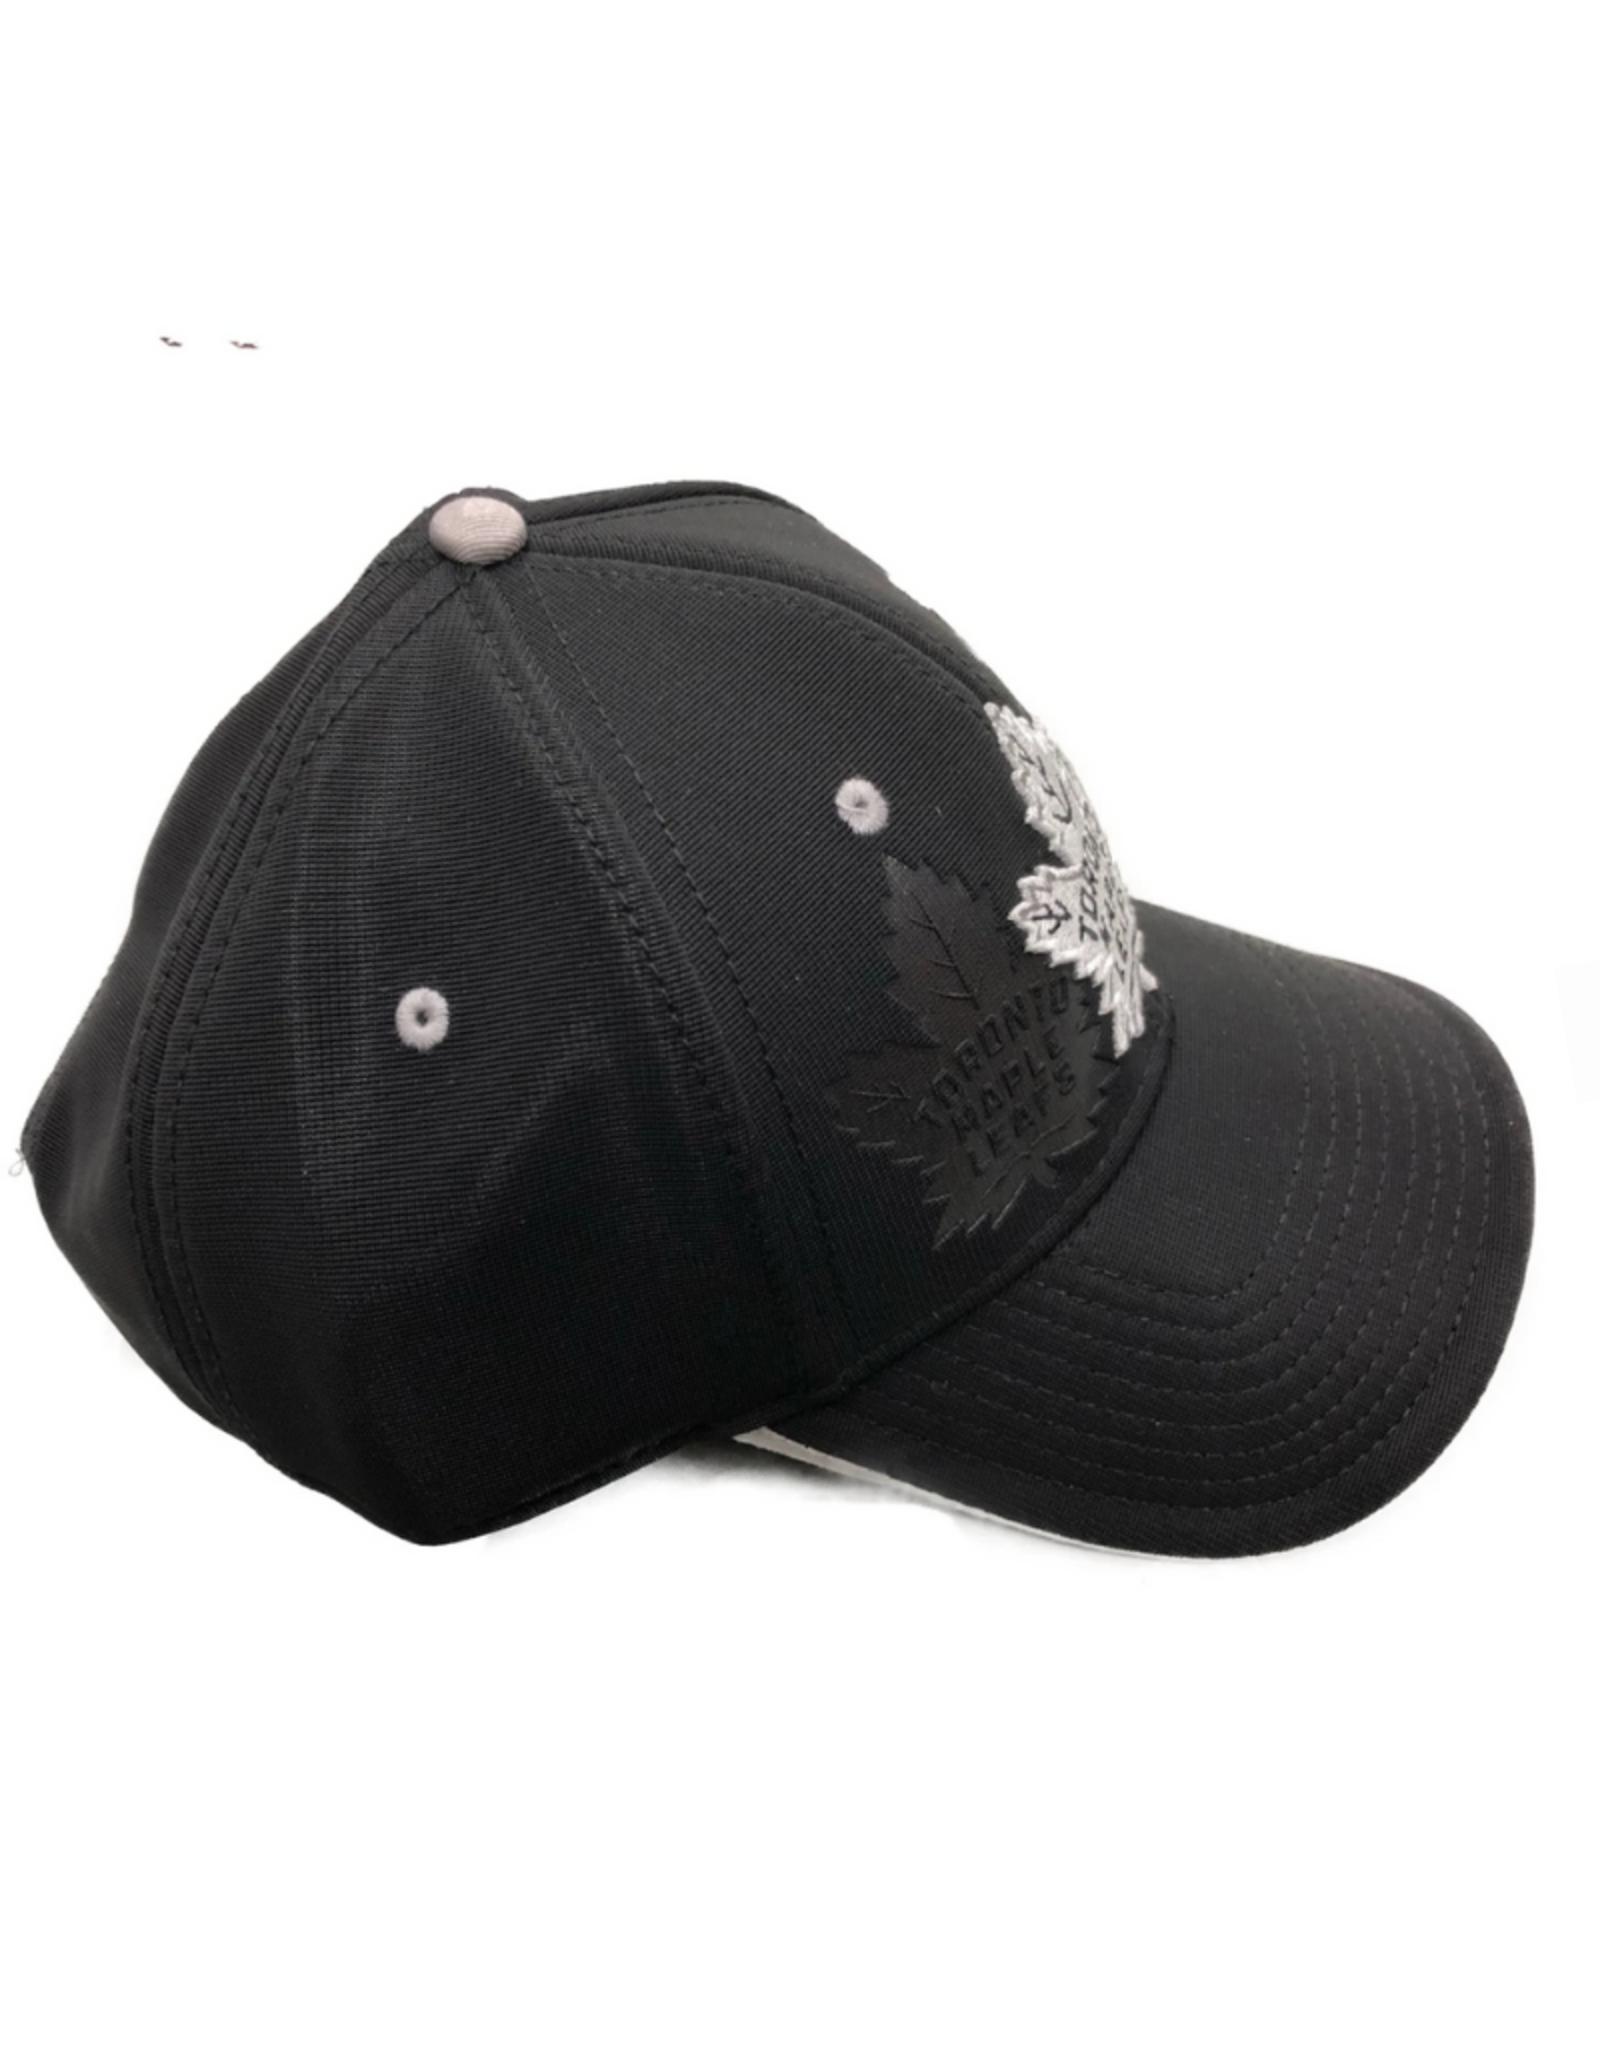 American Needle American Needle Men's Platinum DeBoss Adjustable Hat Toronto Maple Leafs Black